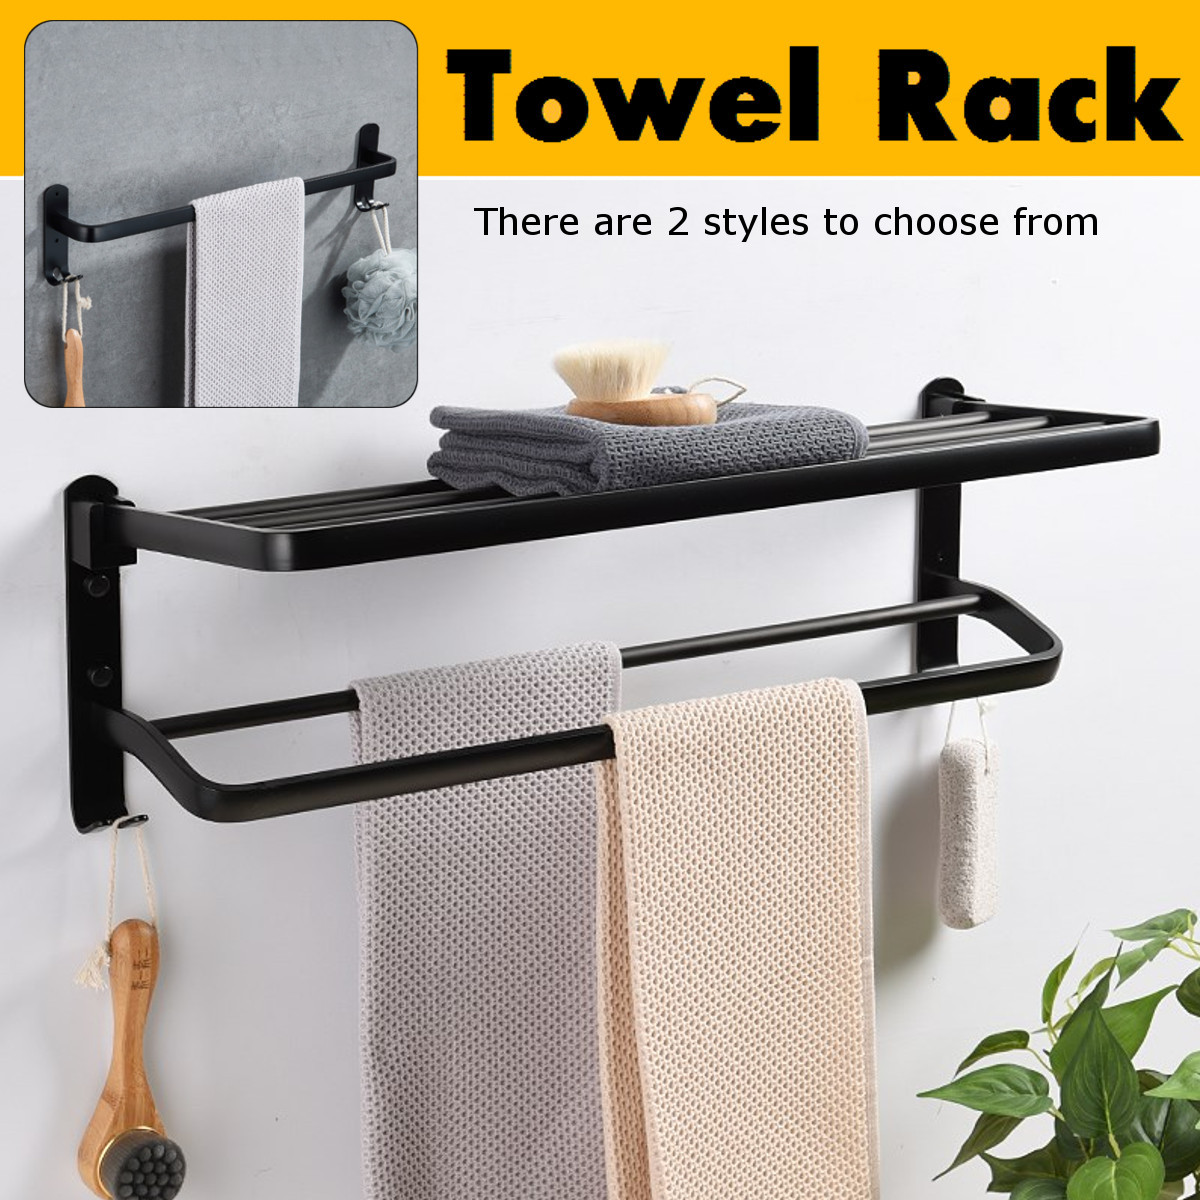 60cm Black Alumimum Foldable Towel Rack Holder Towel Shelf Wall Mounted Bathroom Towel Rack Storage Hanger Shelf